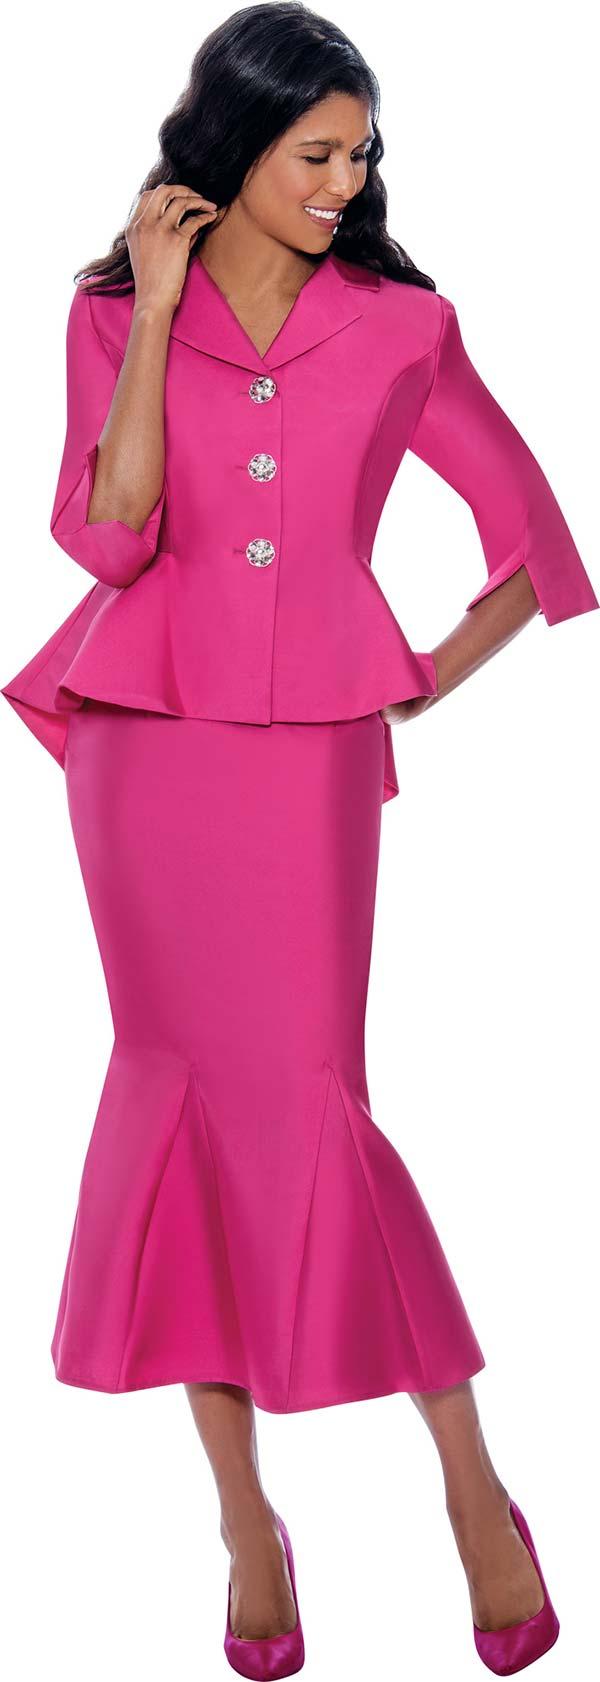 GMI G8342 - Womens Suit With Notch Lapel Peplum Jacket And Godet Skirt